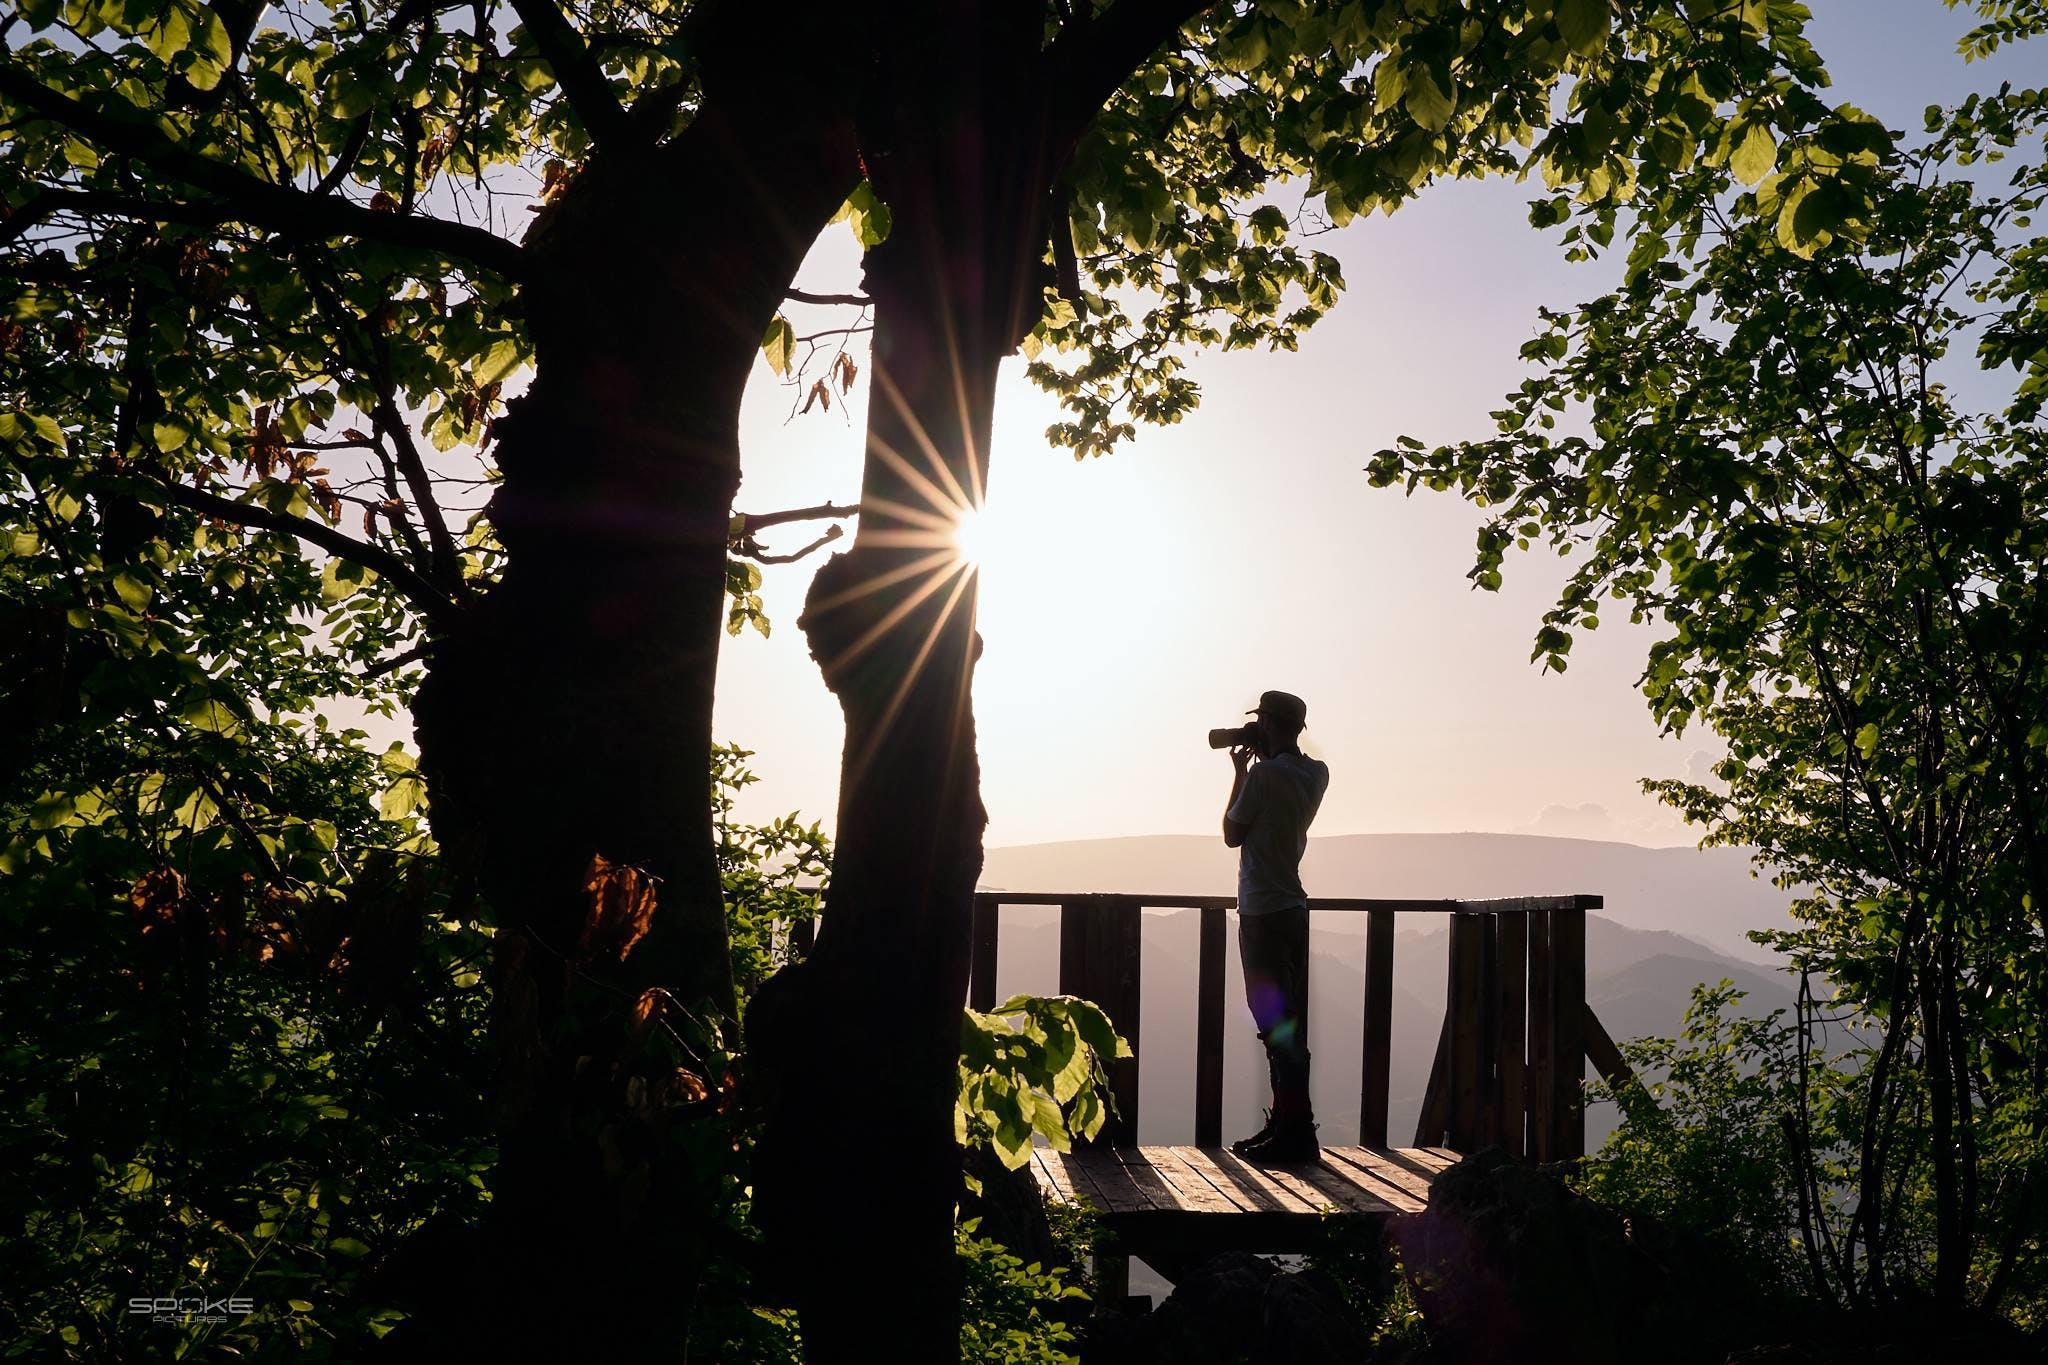 Kostenloses Stock Foto zu bäume, blätter, dämmerung, draußen